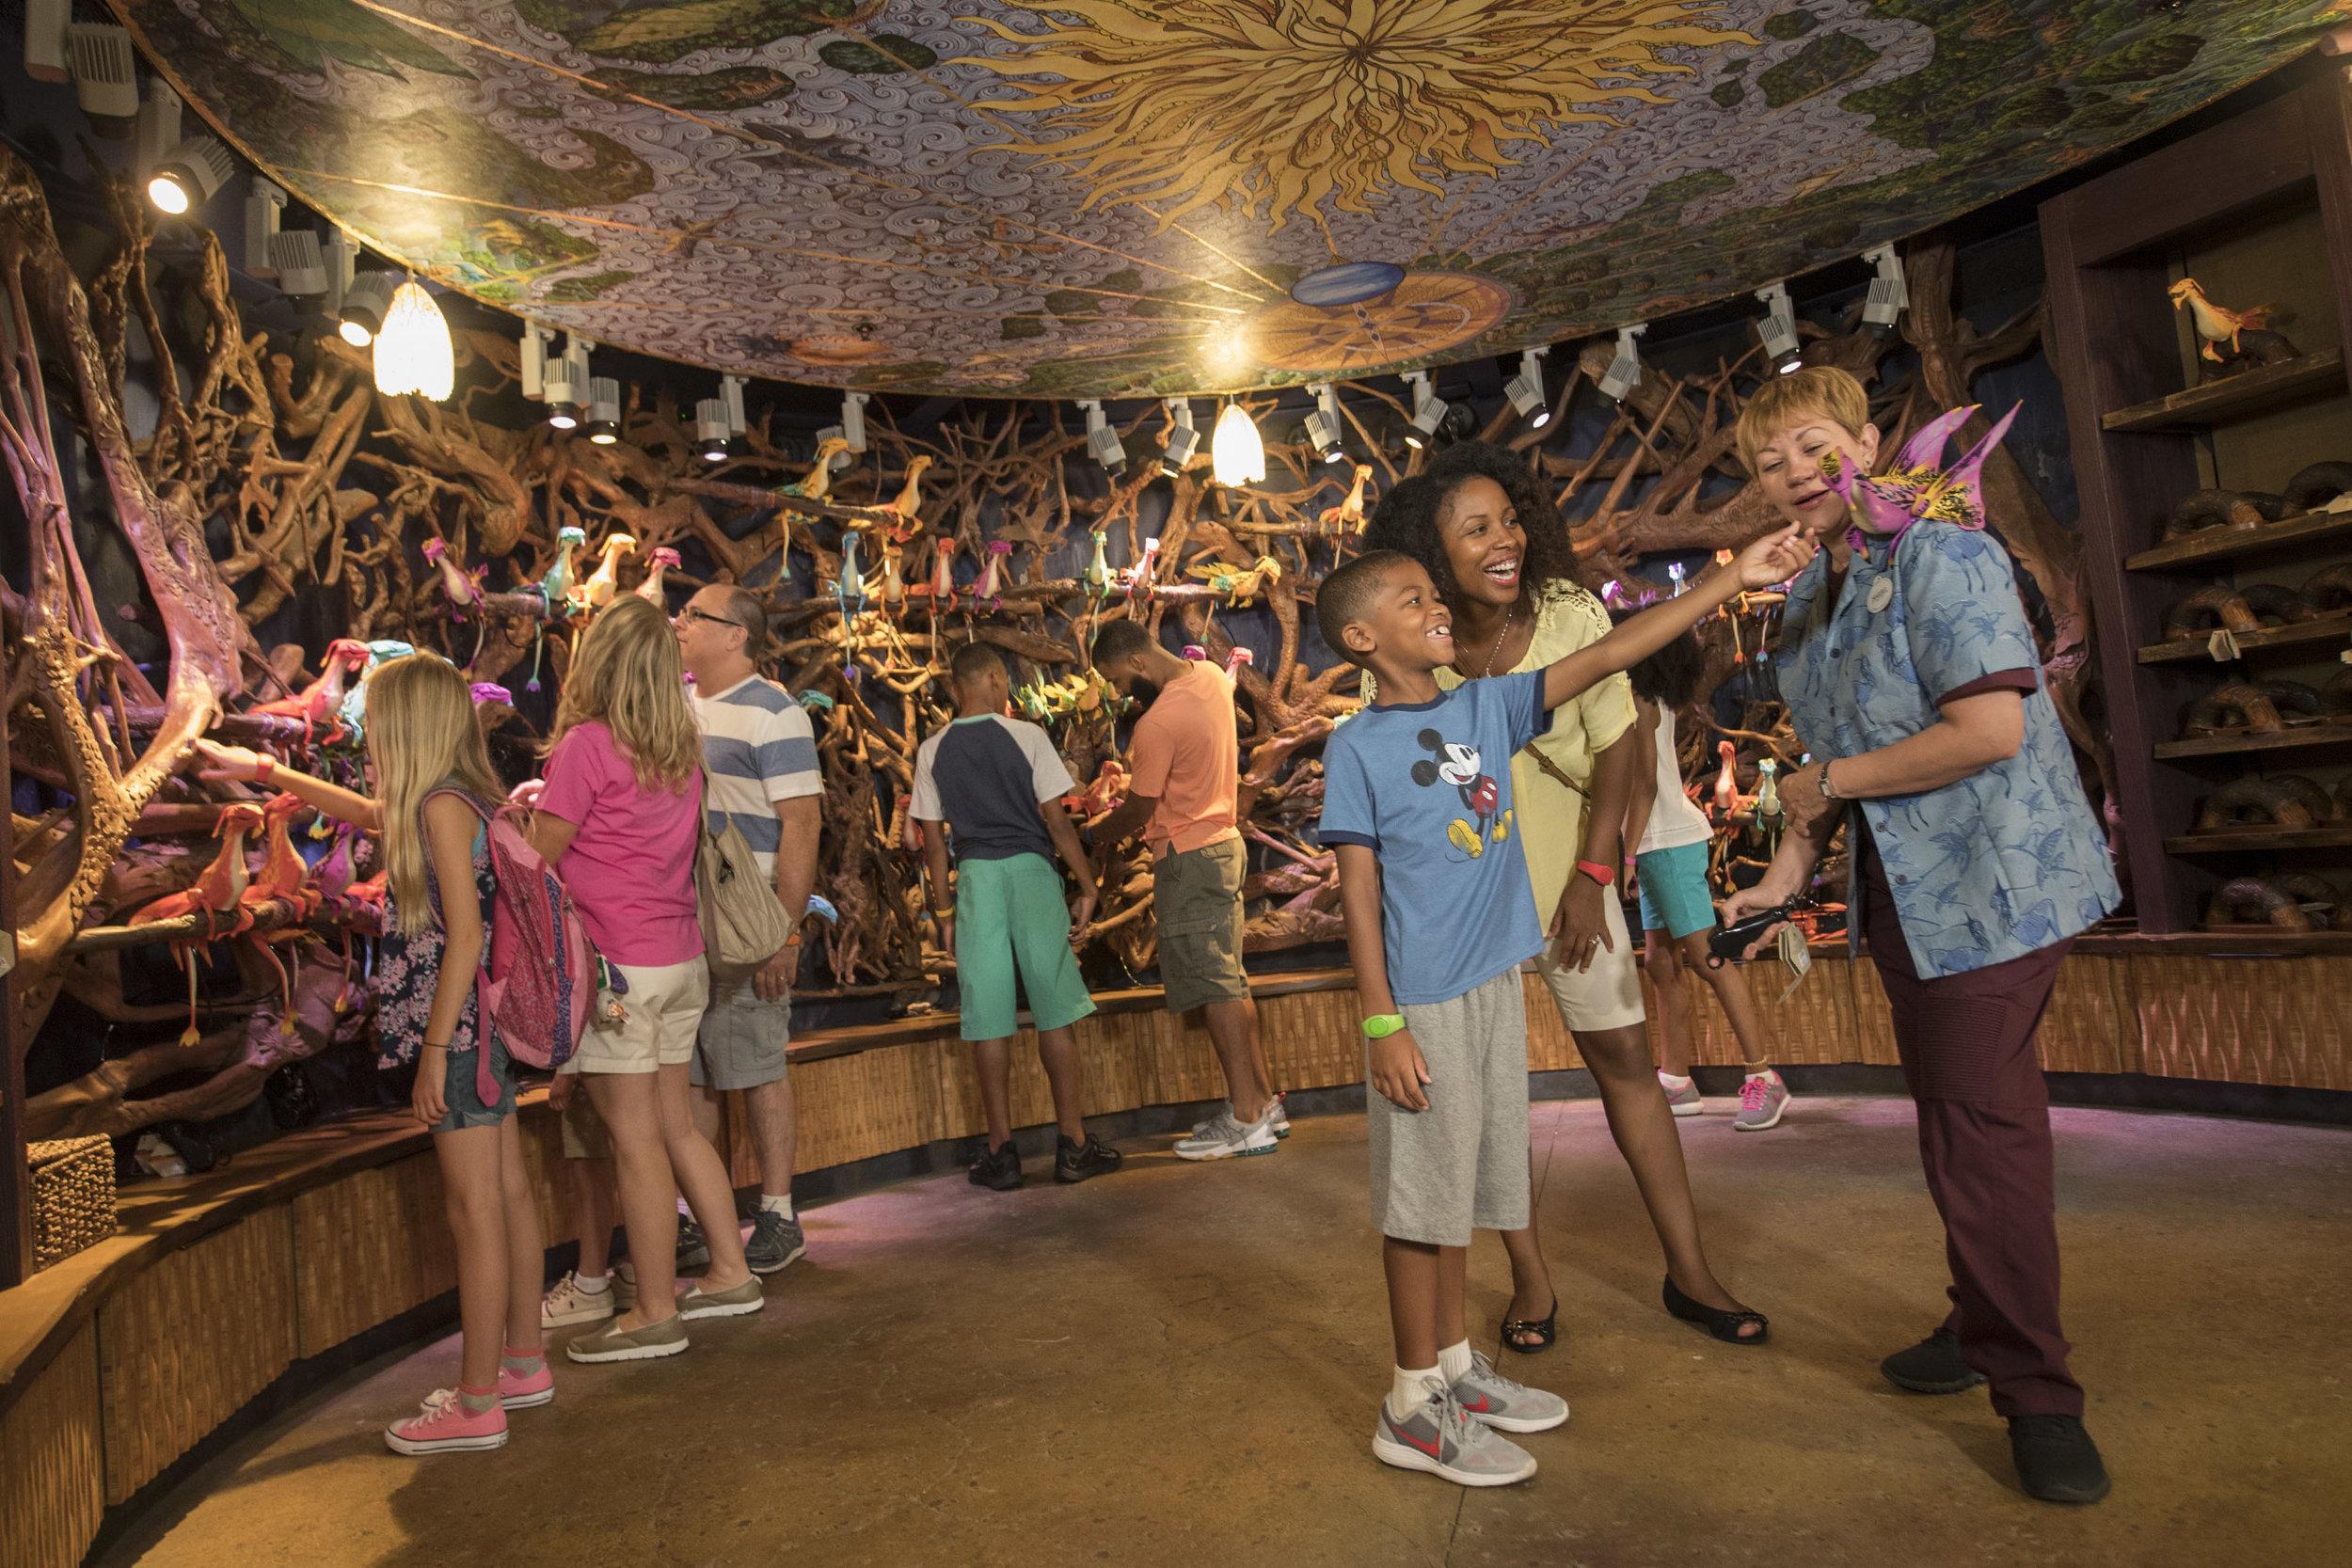 All Photos: Walt Disney World